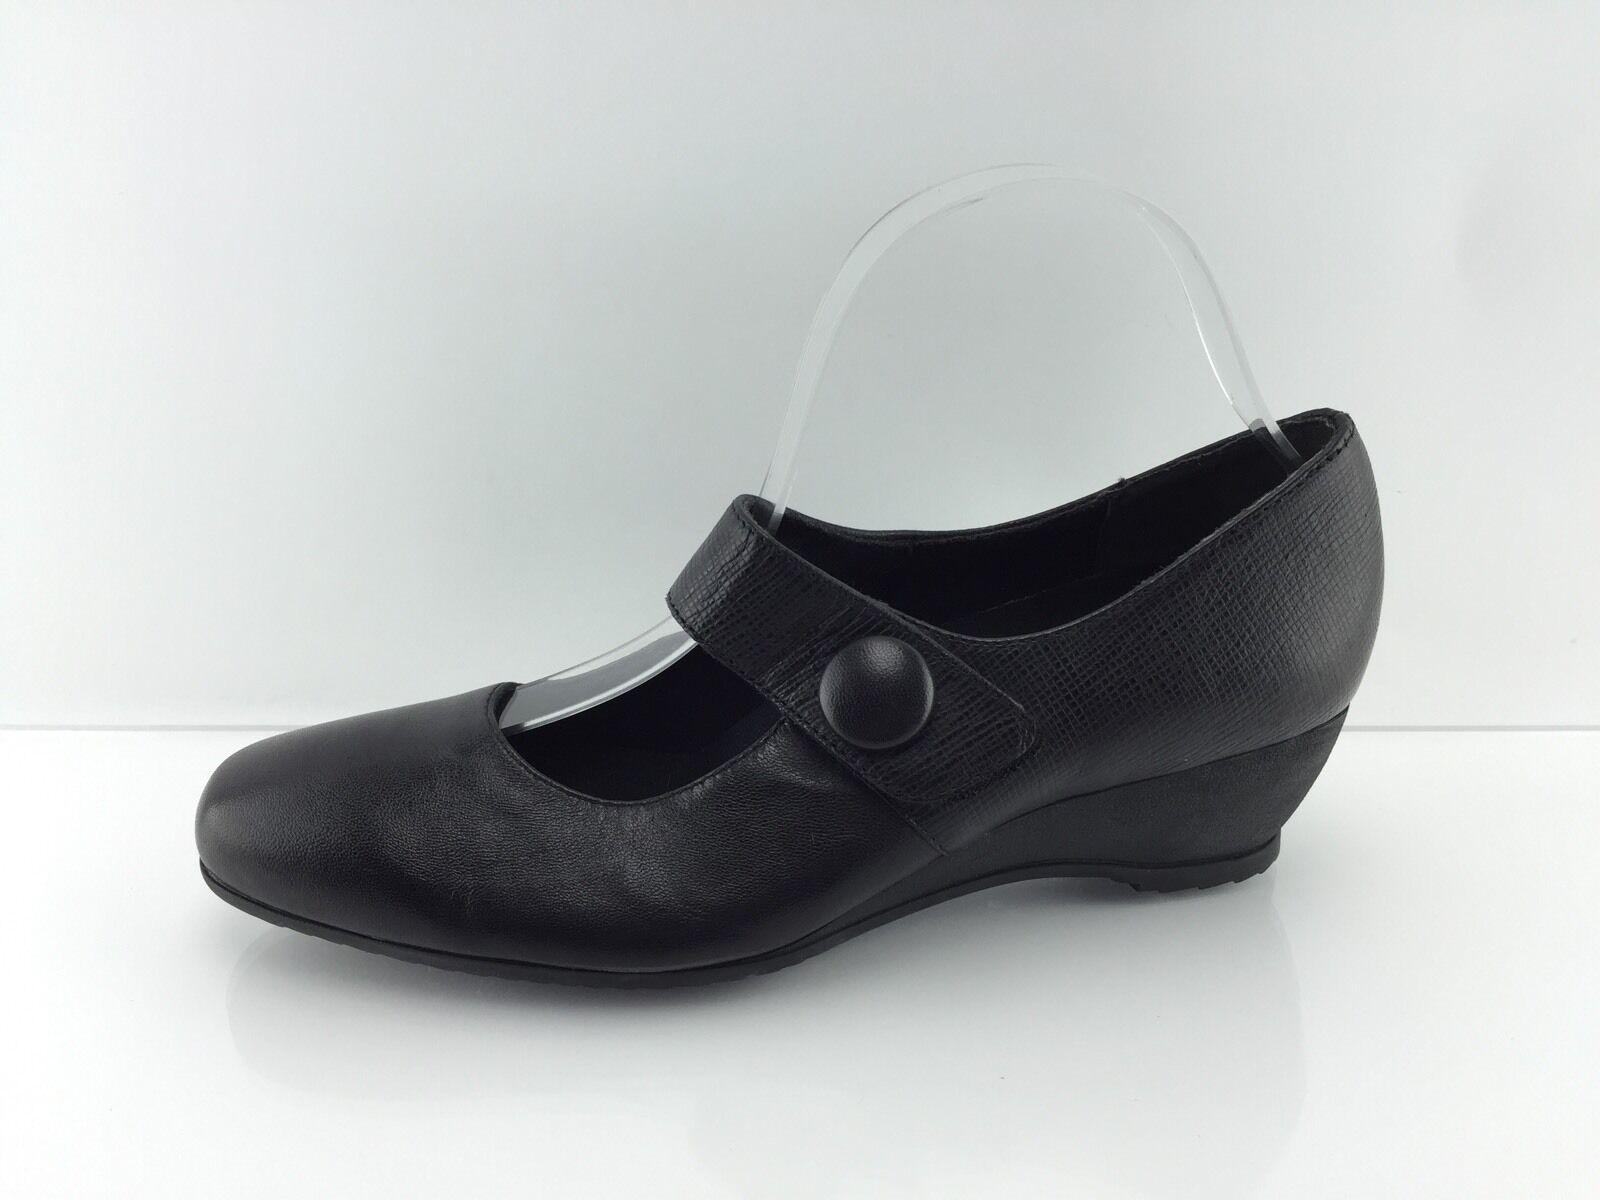 Munro Women's Black Shoes Leather Shoes Black 8 M dc36f5